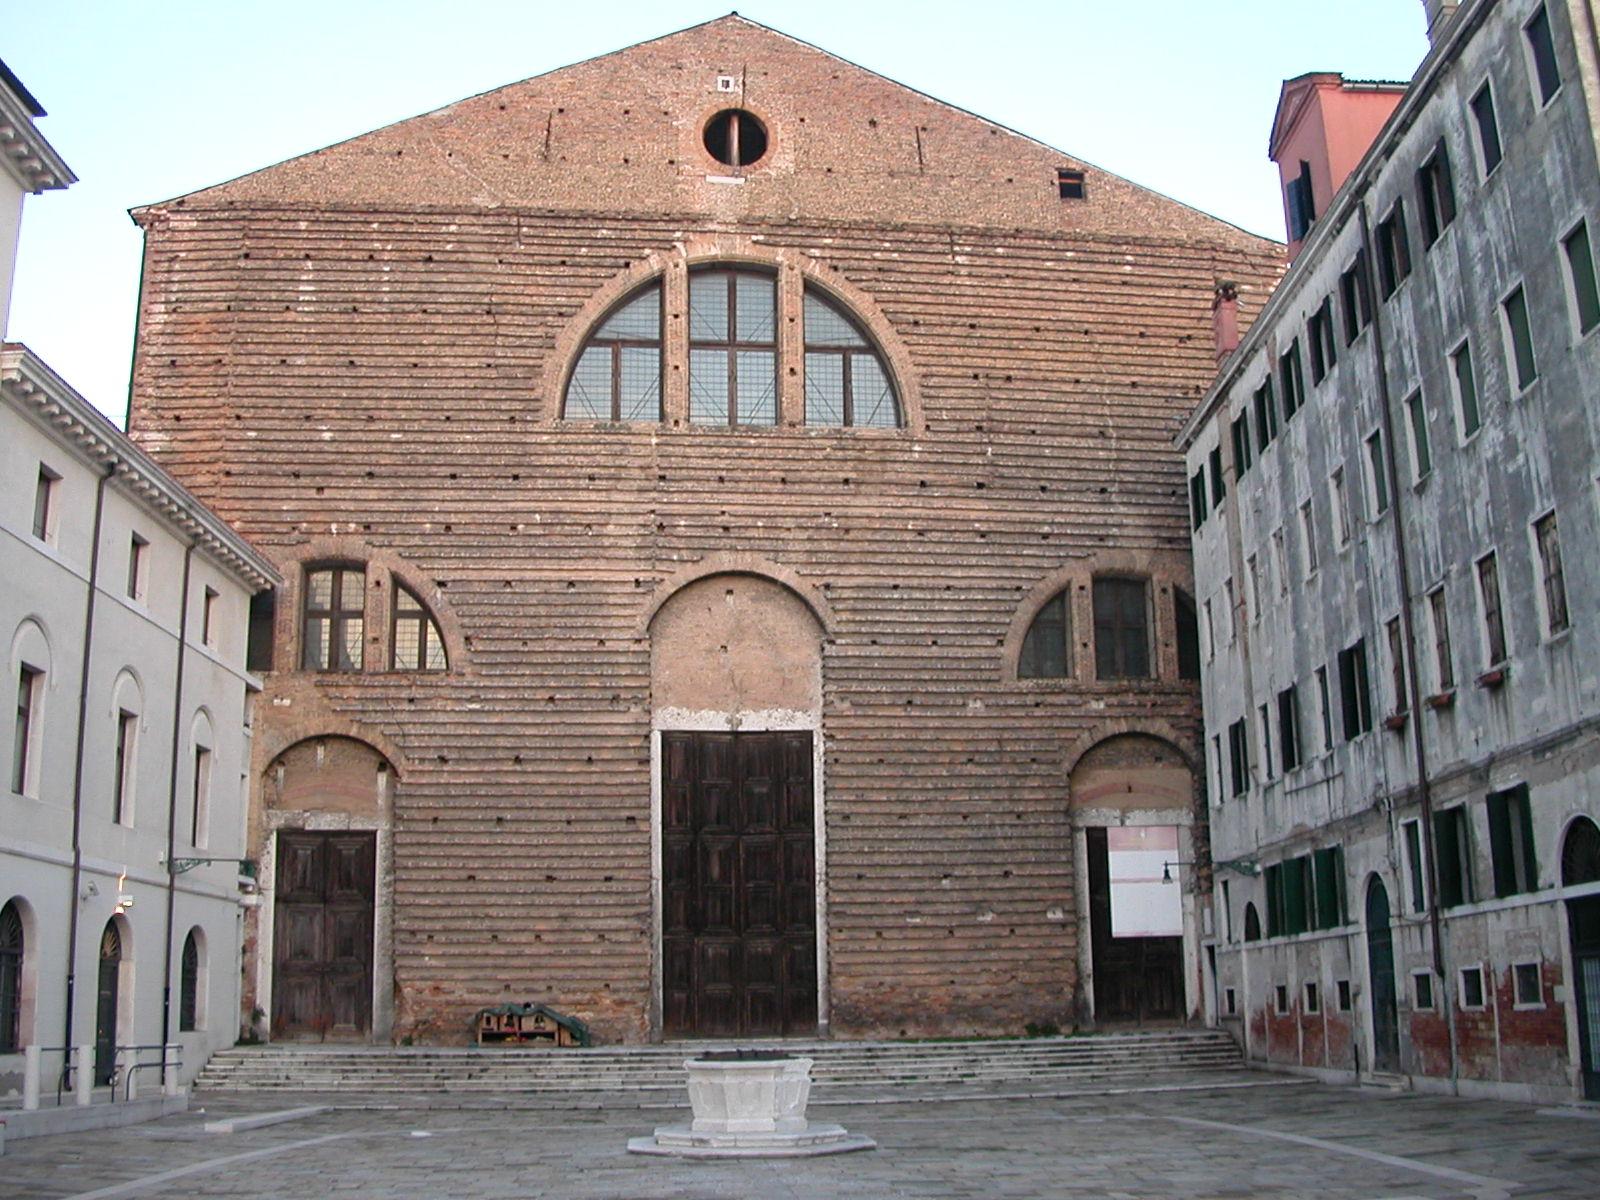 File:Venezia - Chiesa di S.Lorenzo.JPG